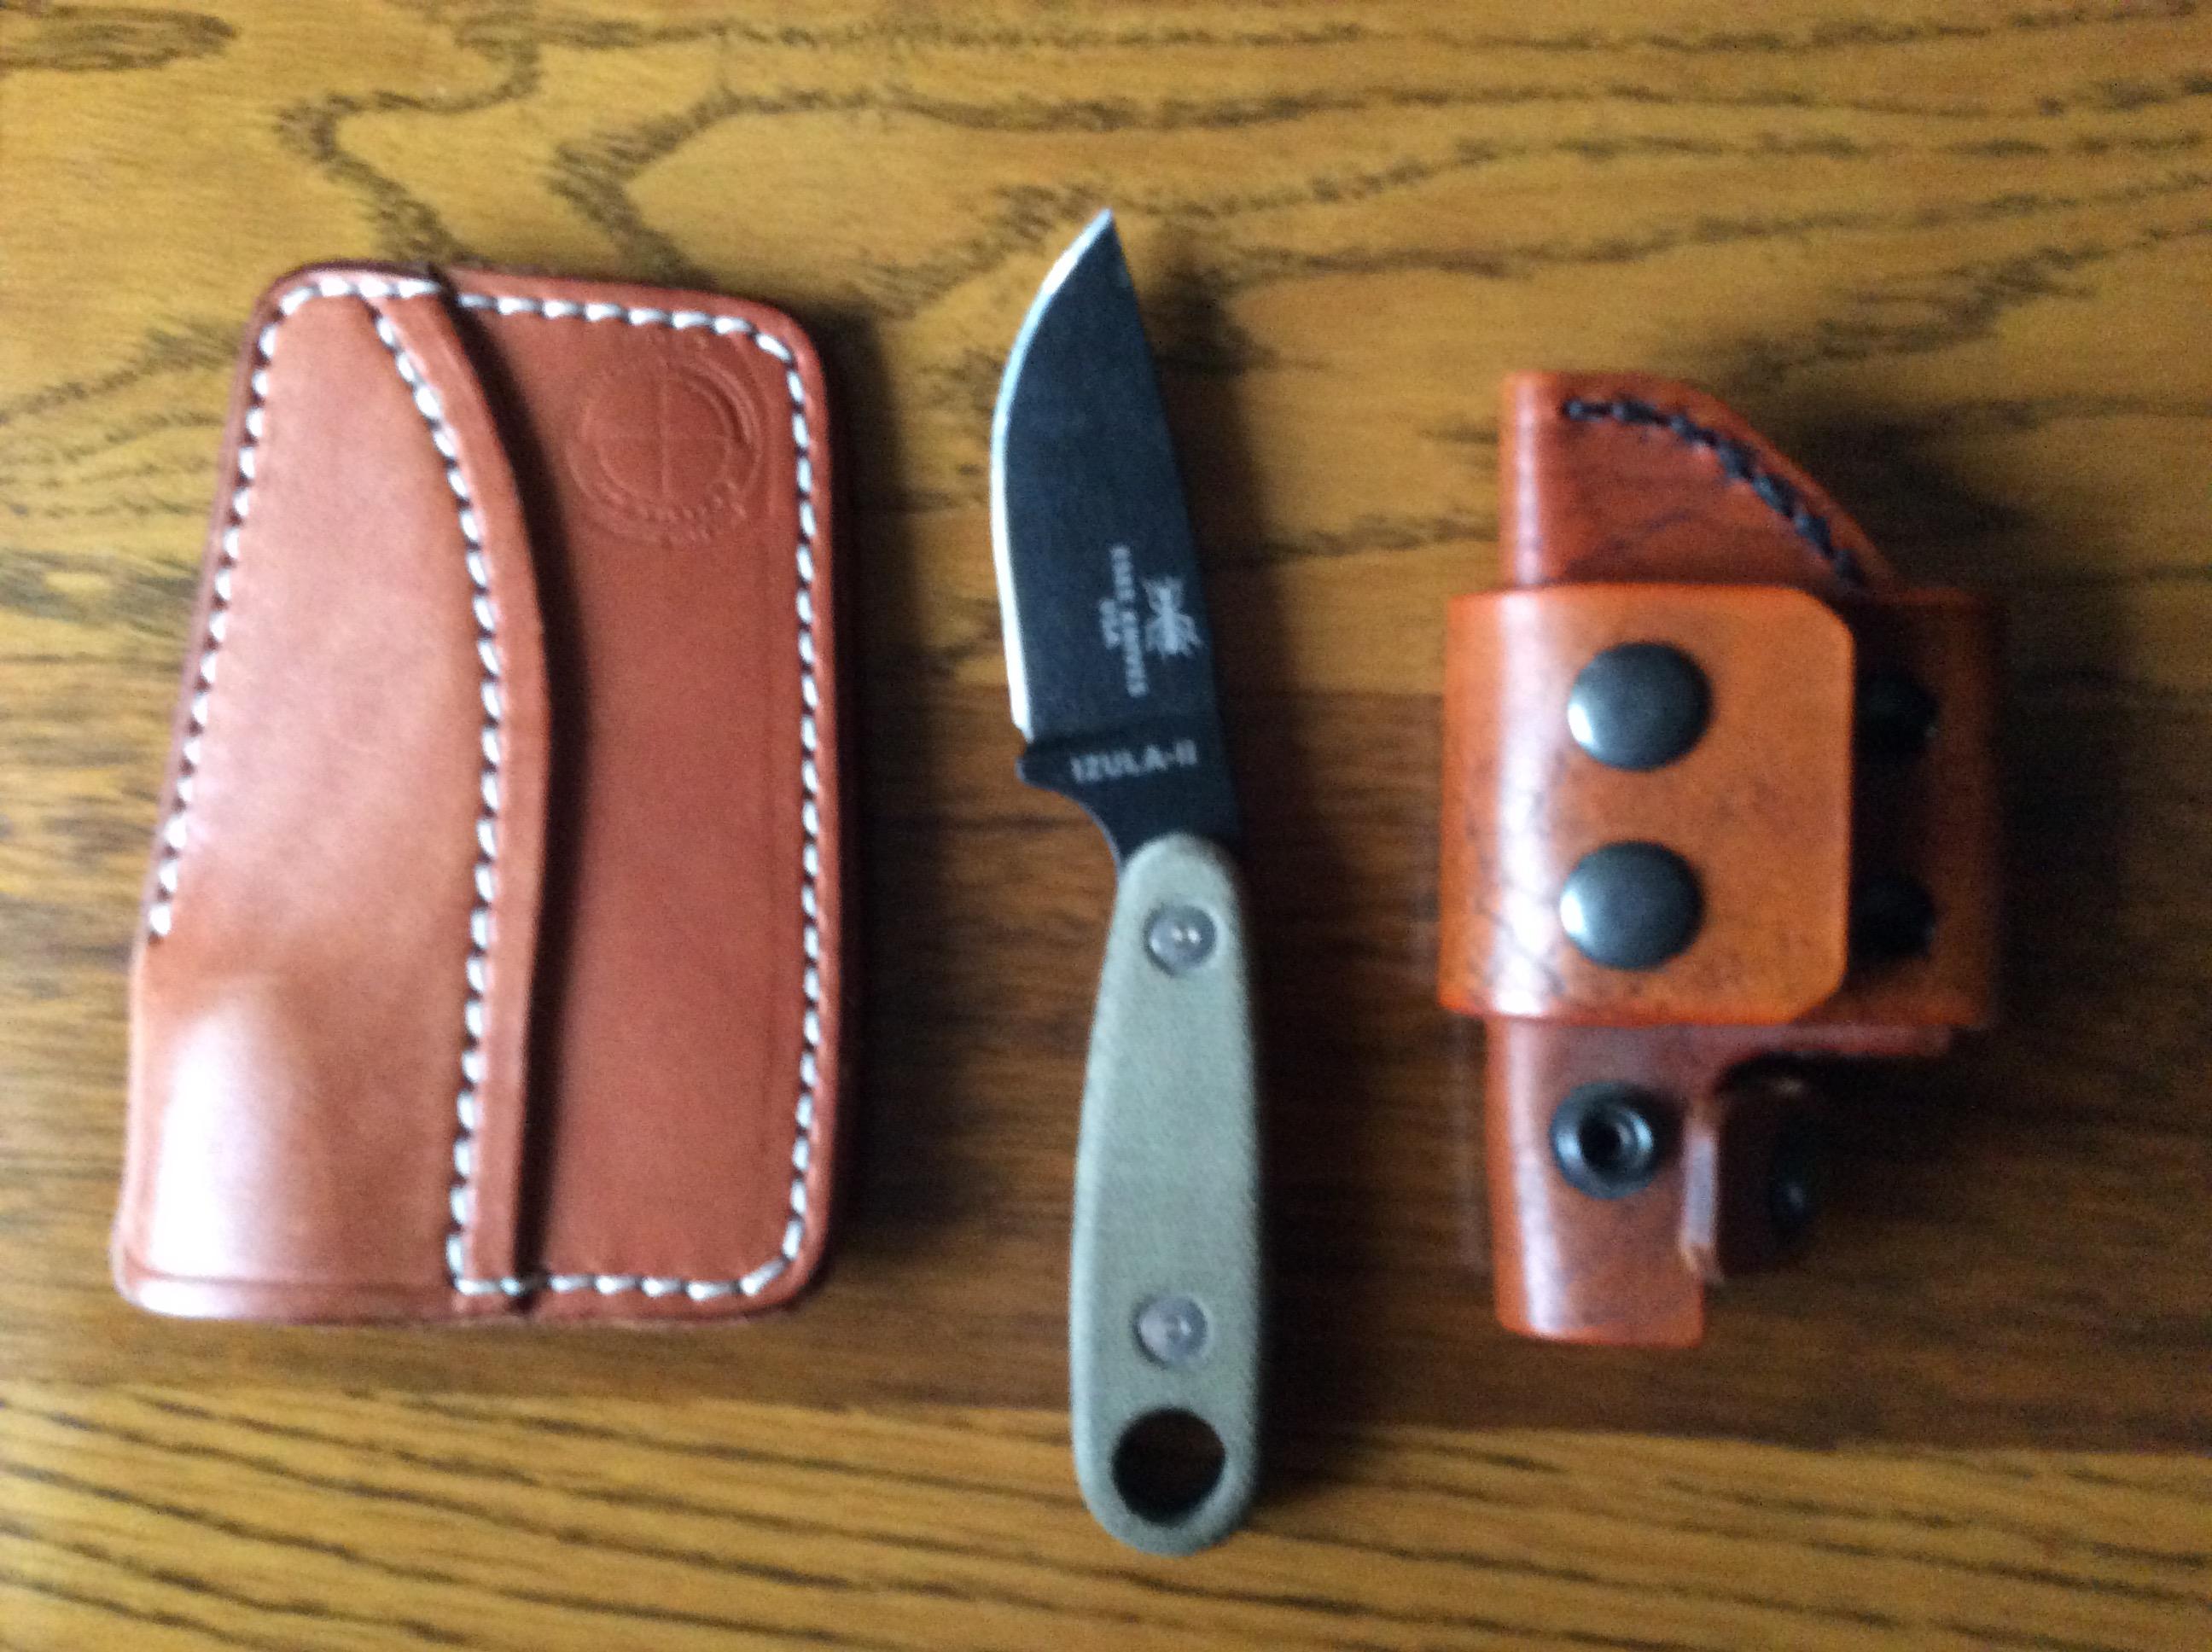 Fixed Blade EDC knife suggestions-674b2975-db91-4945-82ed-93aac3600603.jpeg